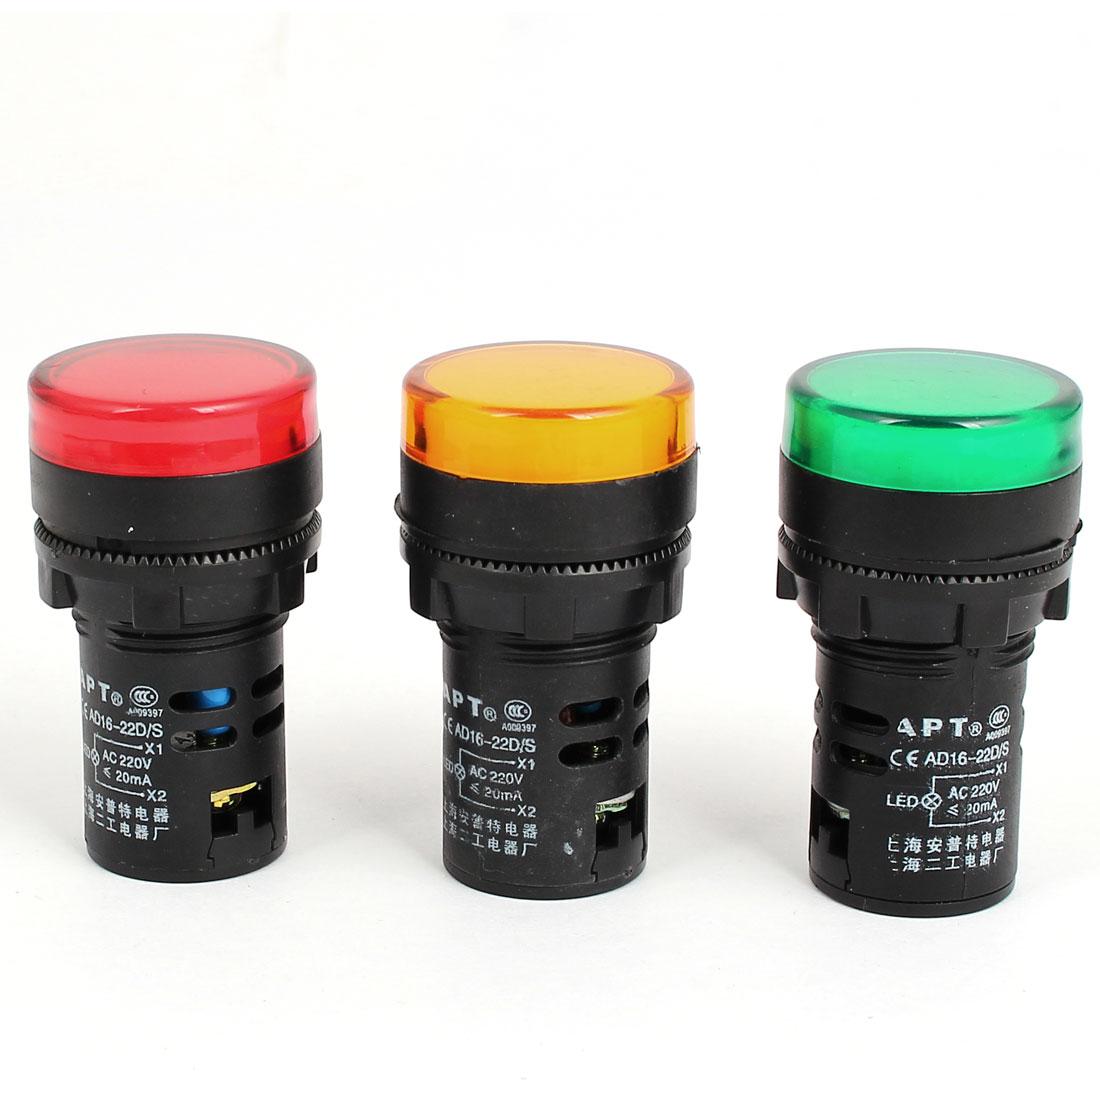 AD16-22D/S AC 220V 20mA Green Yellow Red LED Indicator Pilot Signal Light Lamp 3Pcs